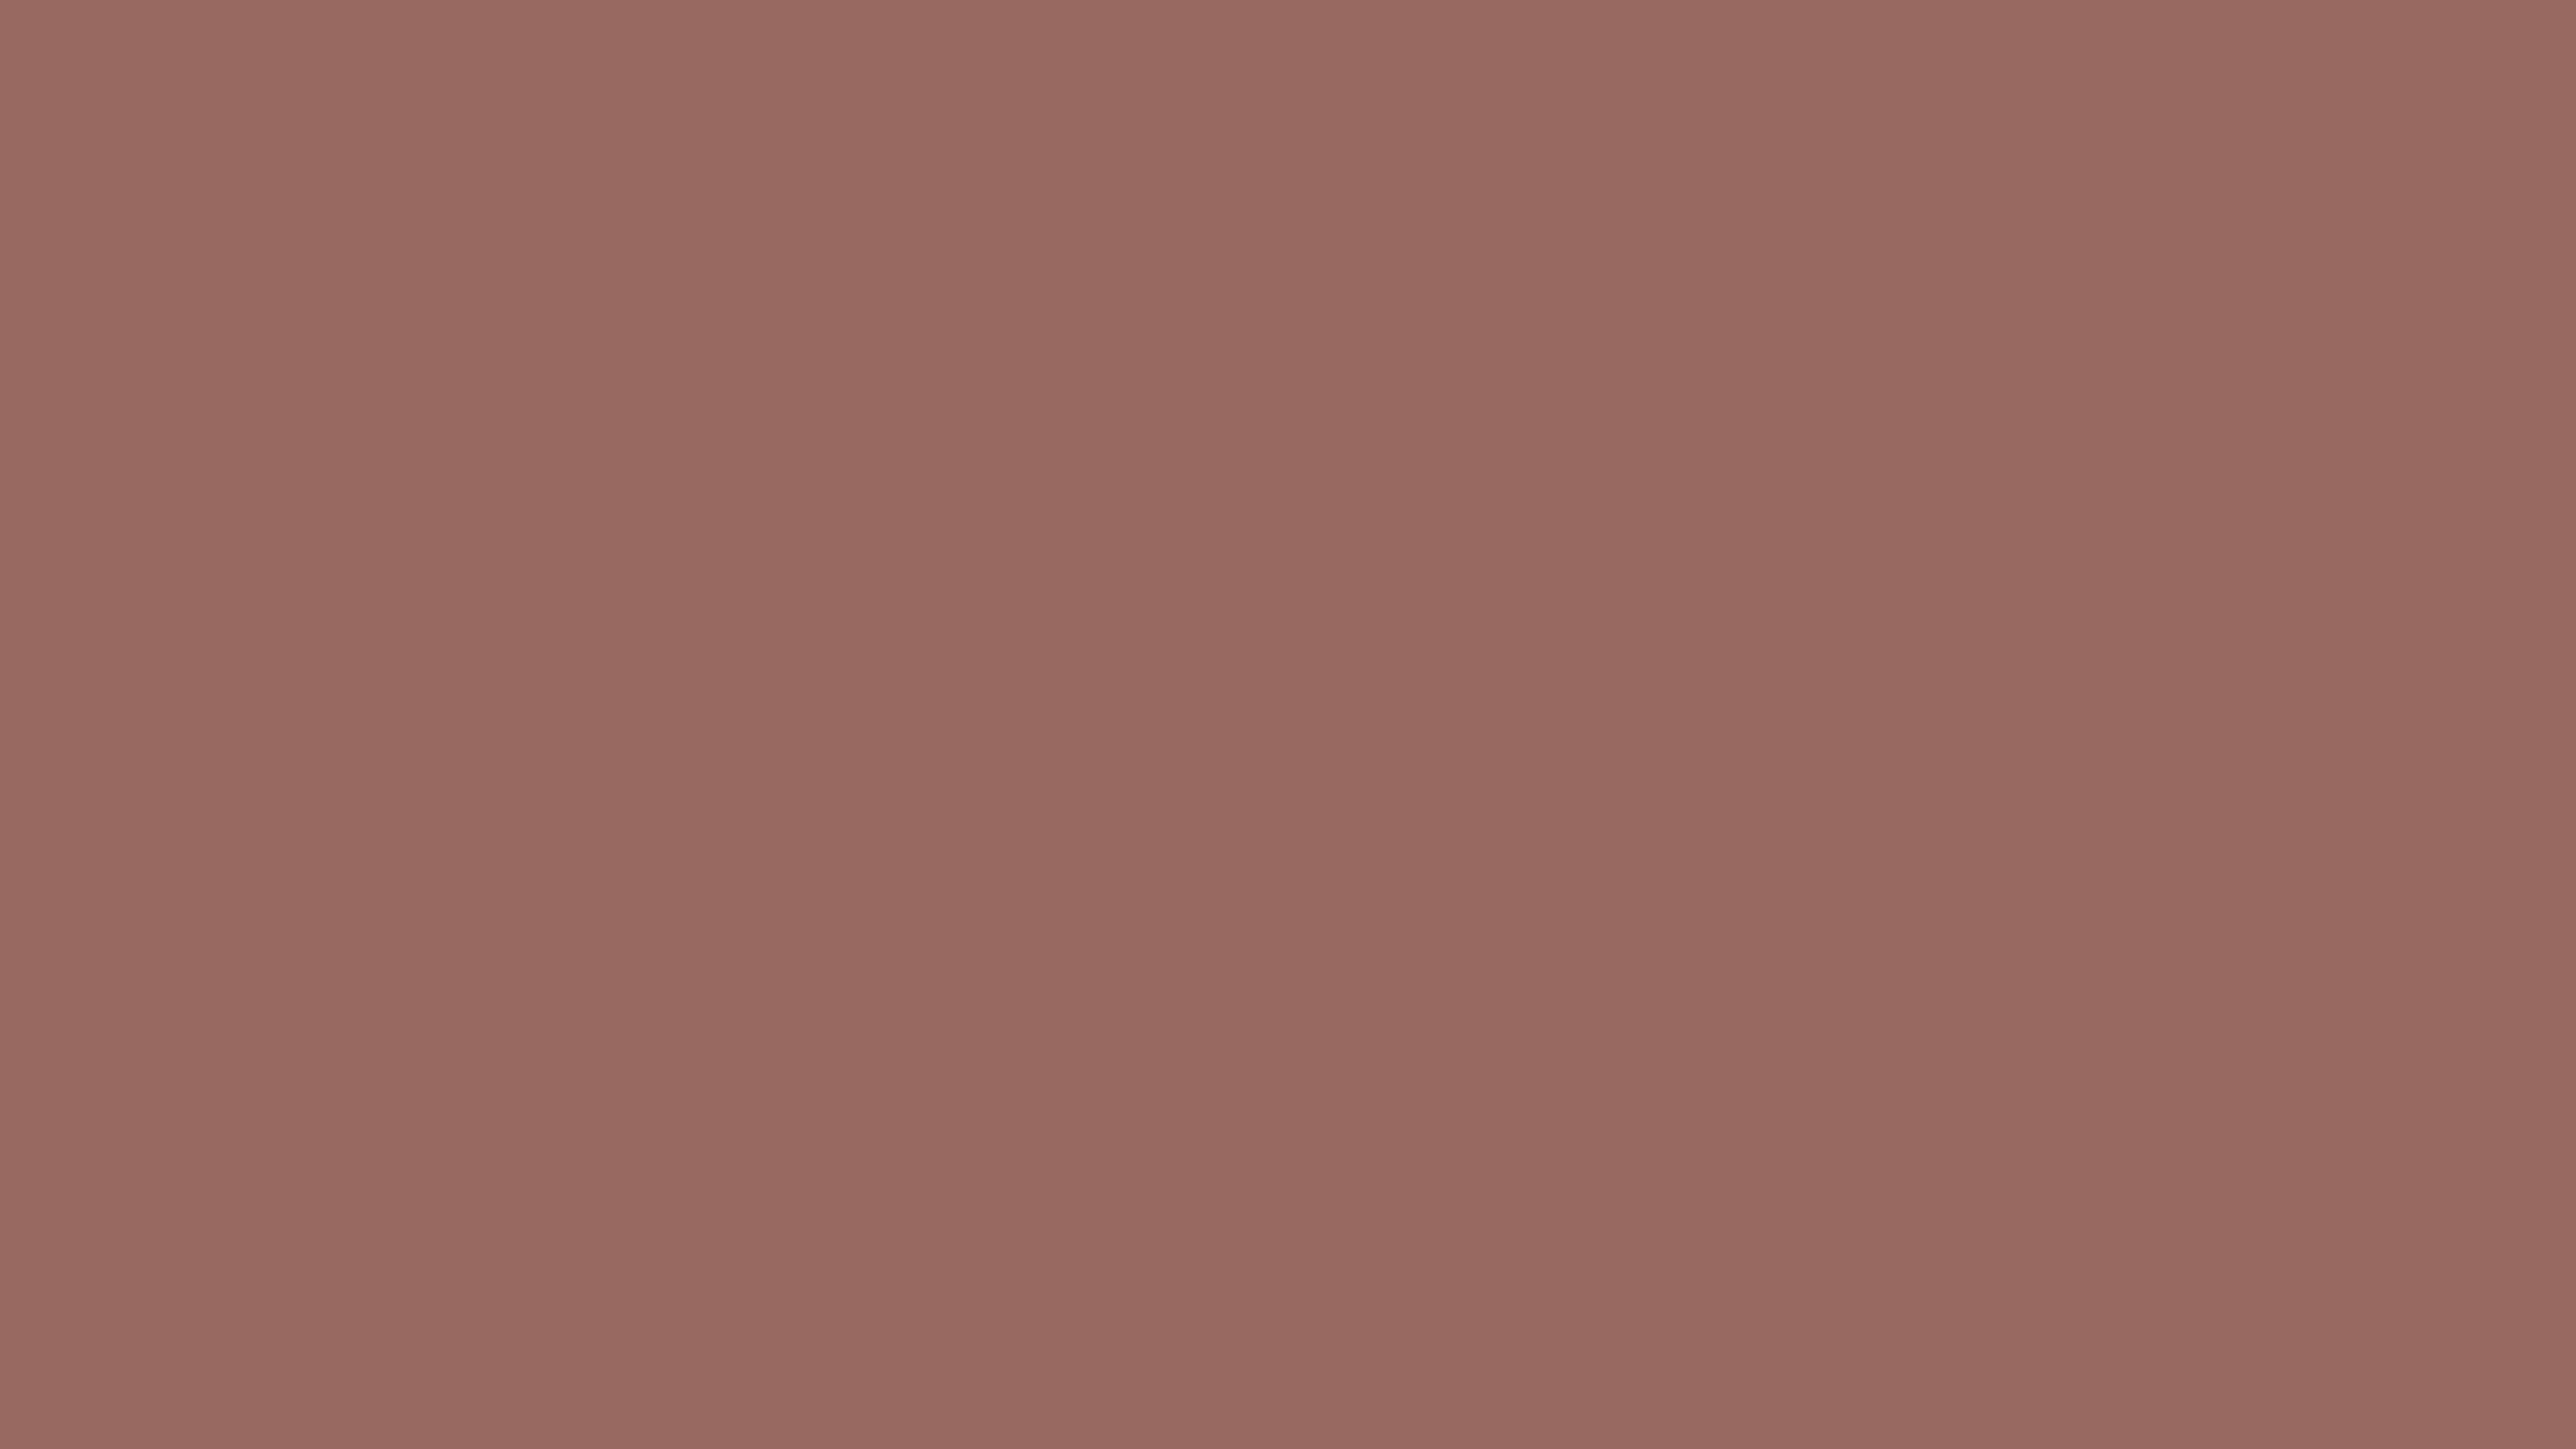 3840x2160 Dark Chestnut Solid Color Background